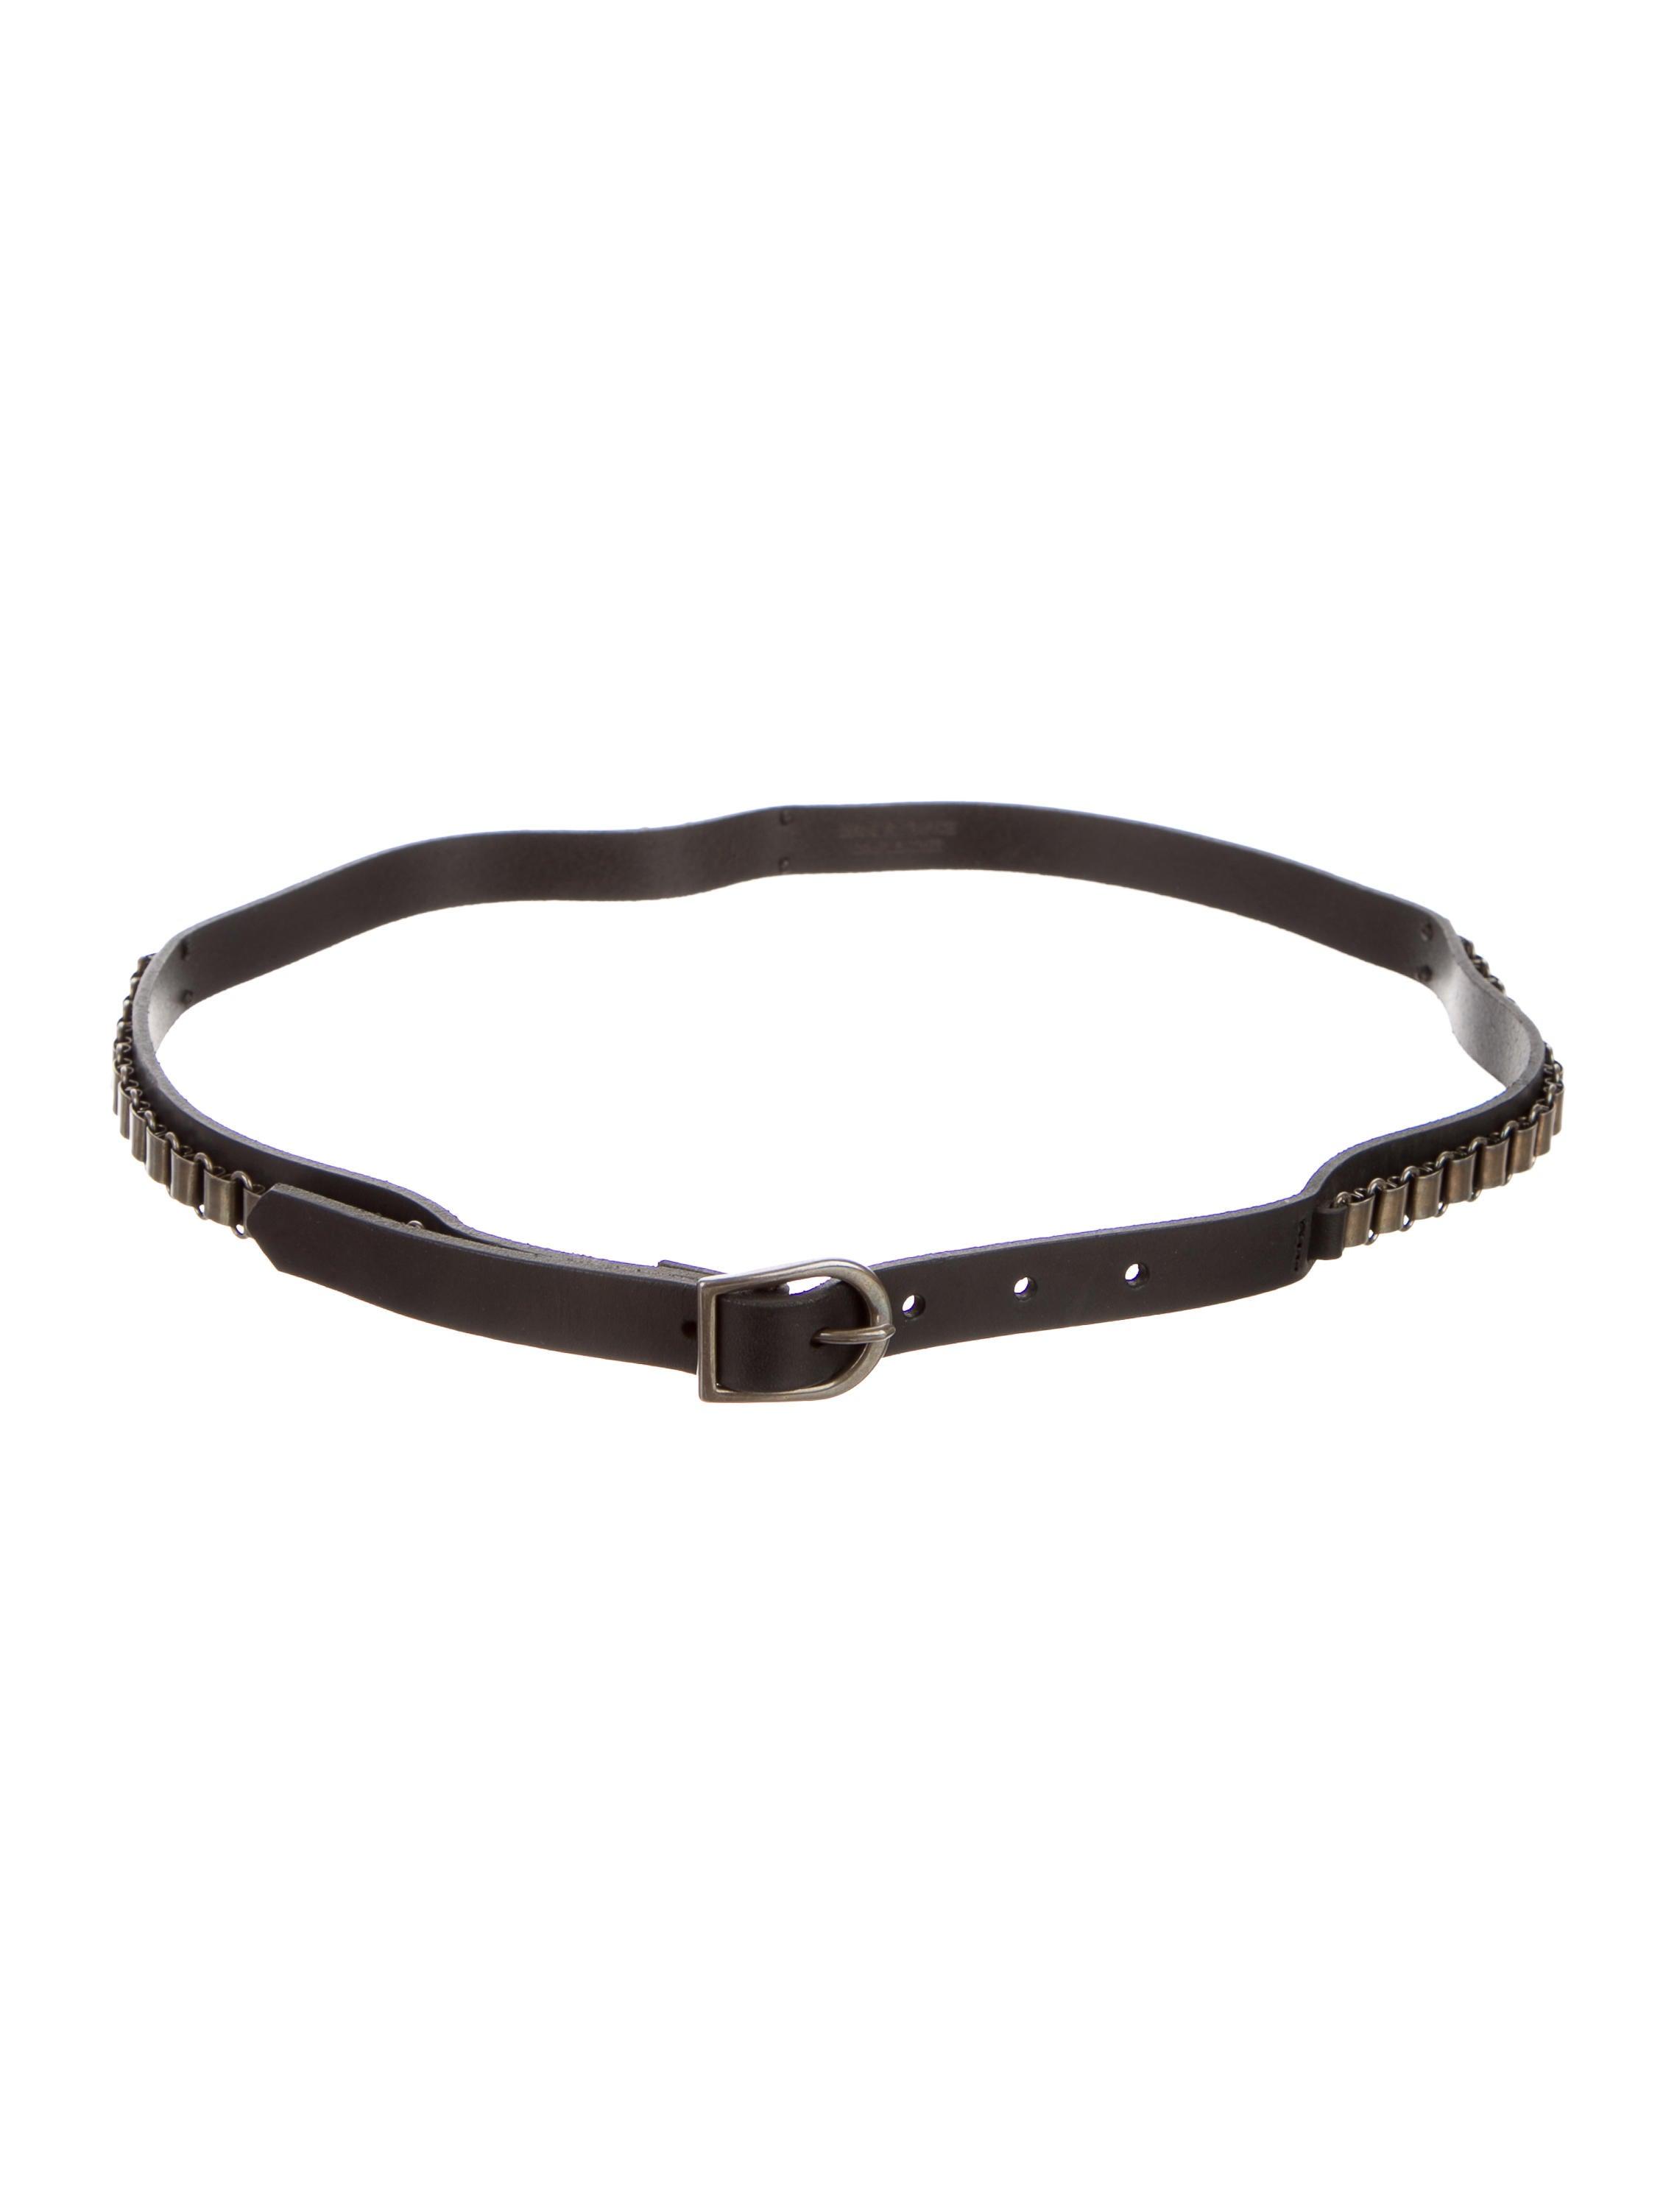 marant leather chain link waist belt accessories